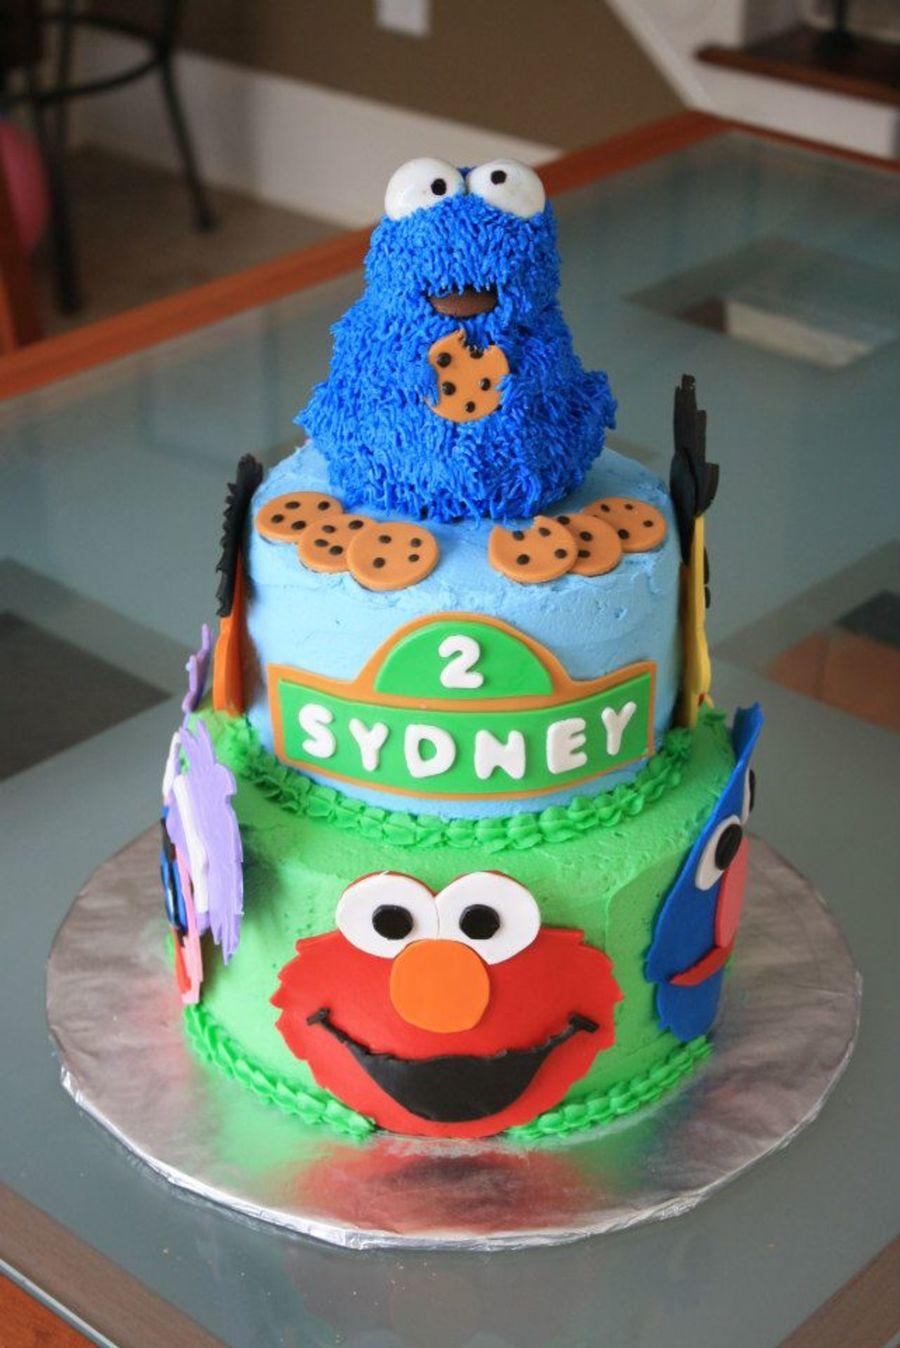 Cake Decorating Sesame Street Birthday : Sesame Street Birthday Cake All Fondant Details ...